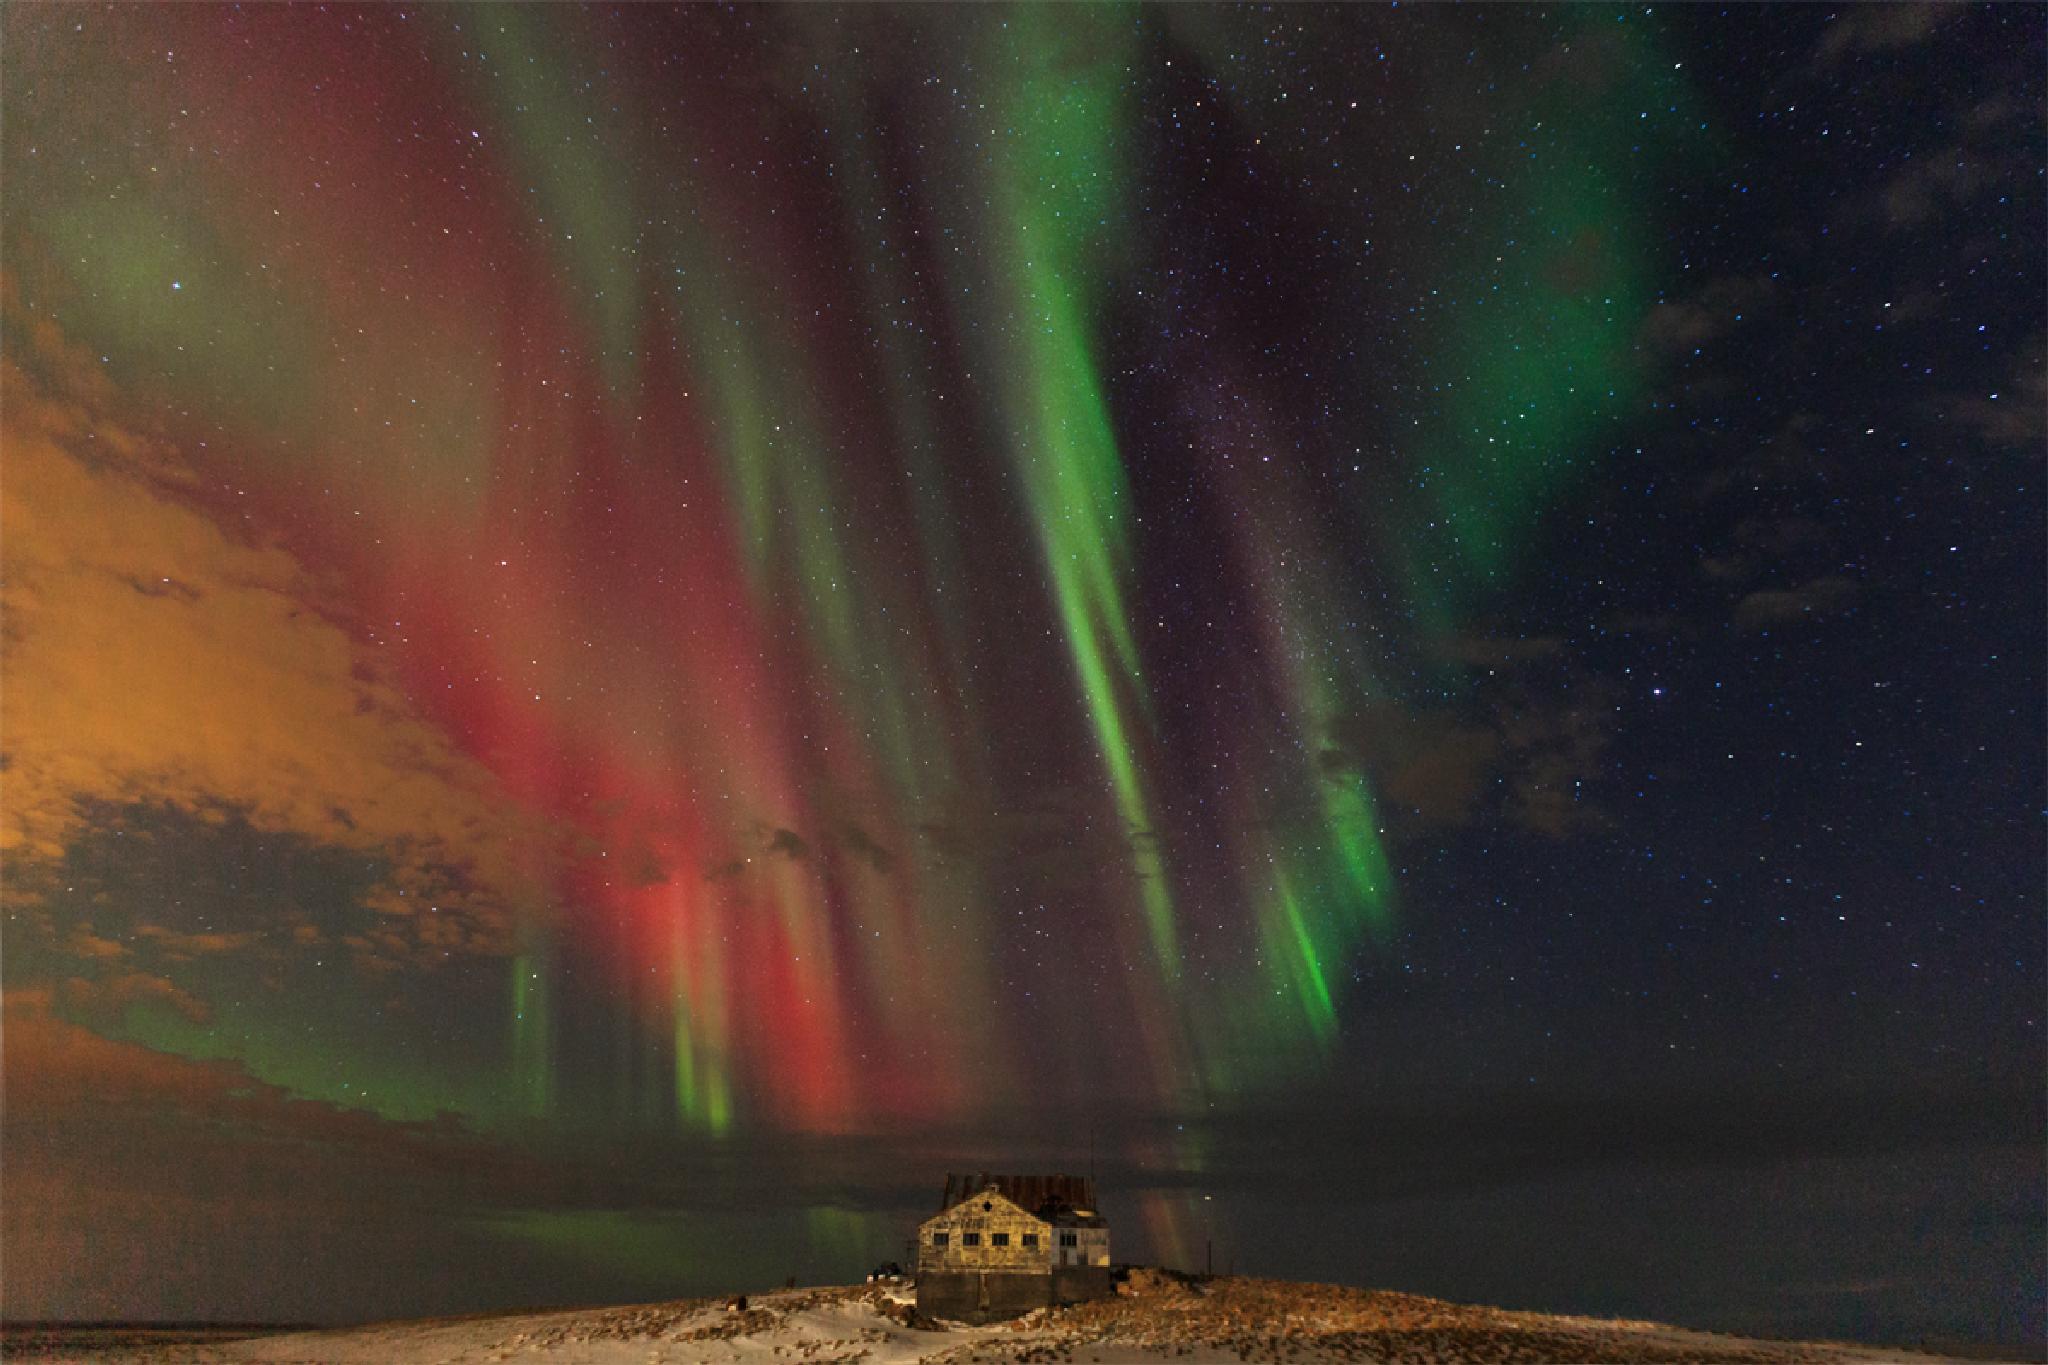 Abandoned farm house in Iceland by Jon Runar Hilmarsson